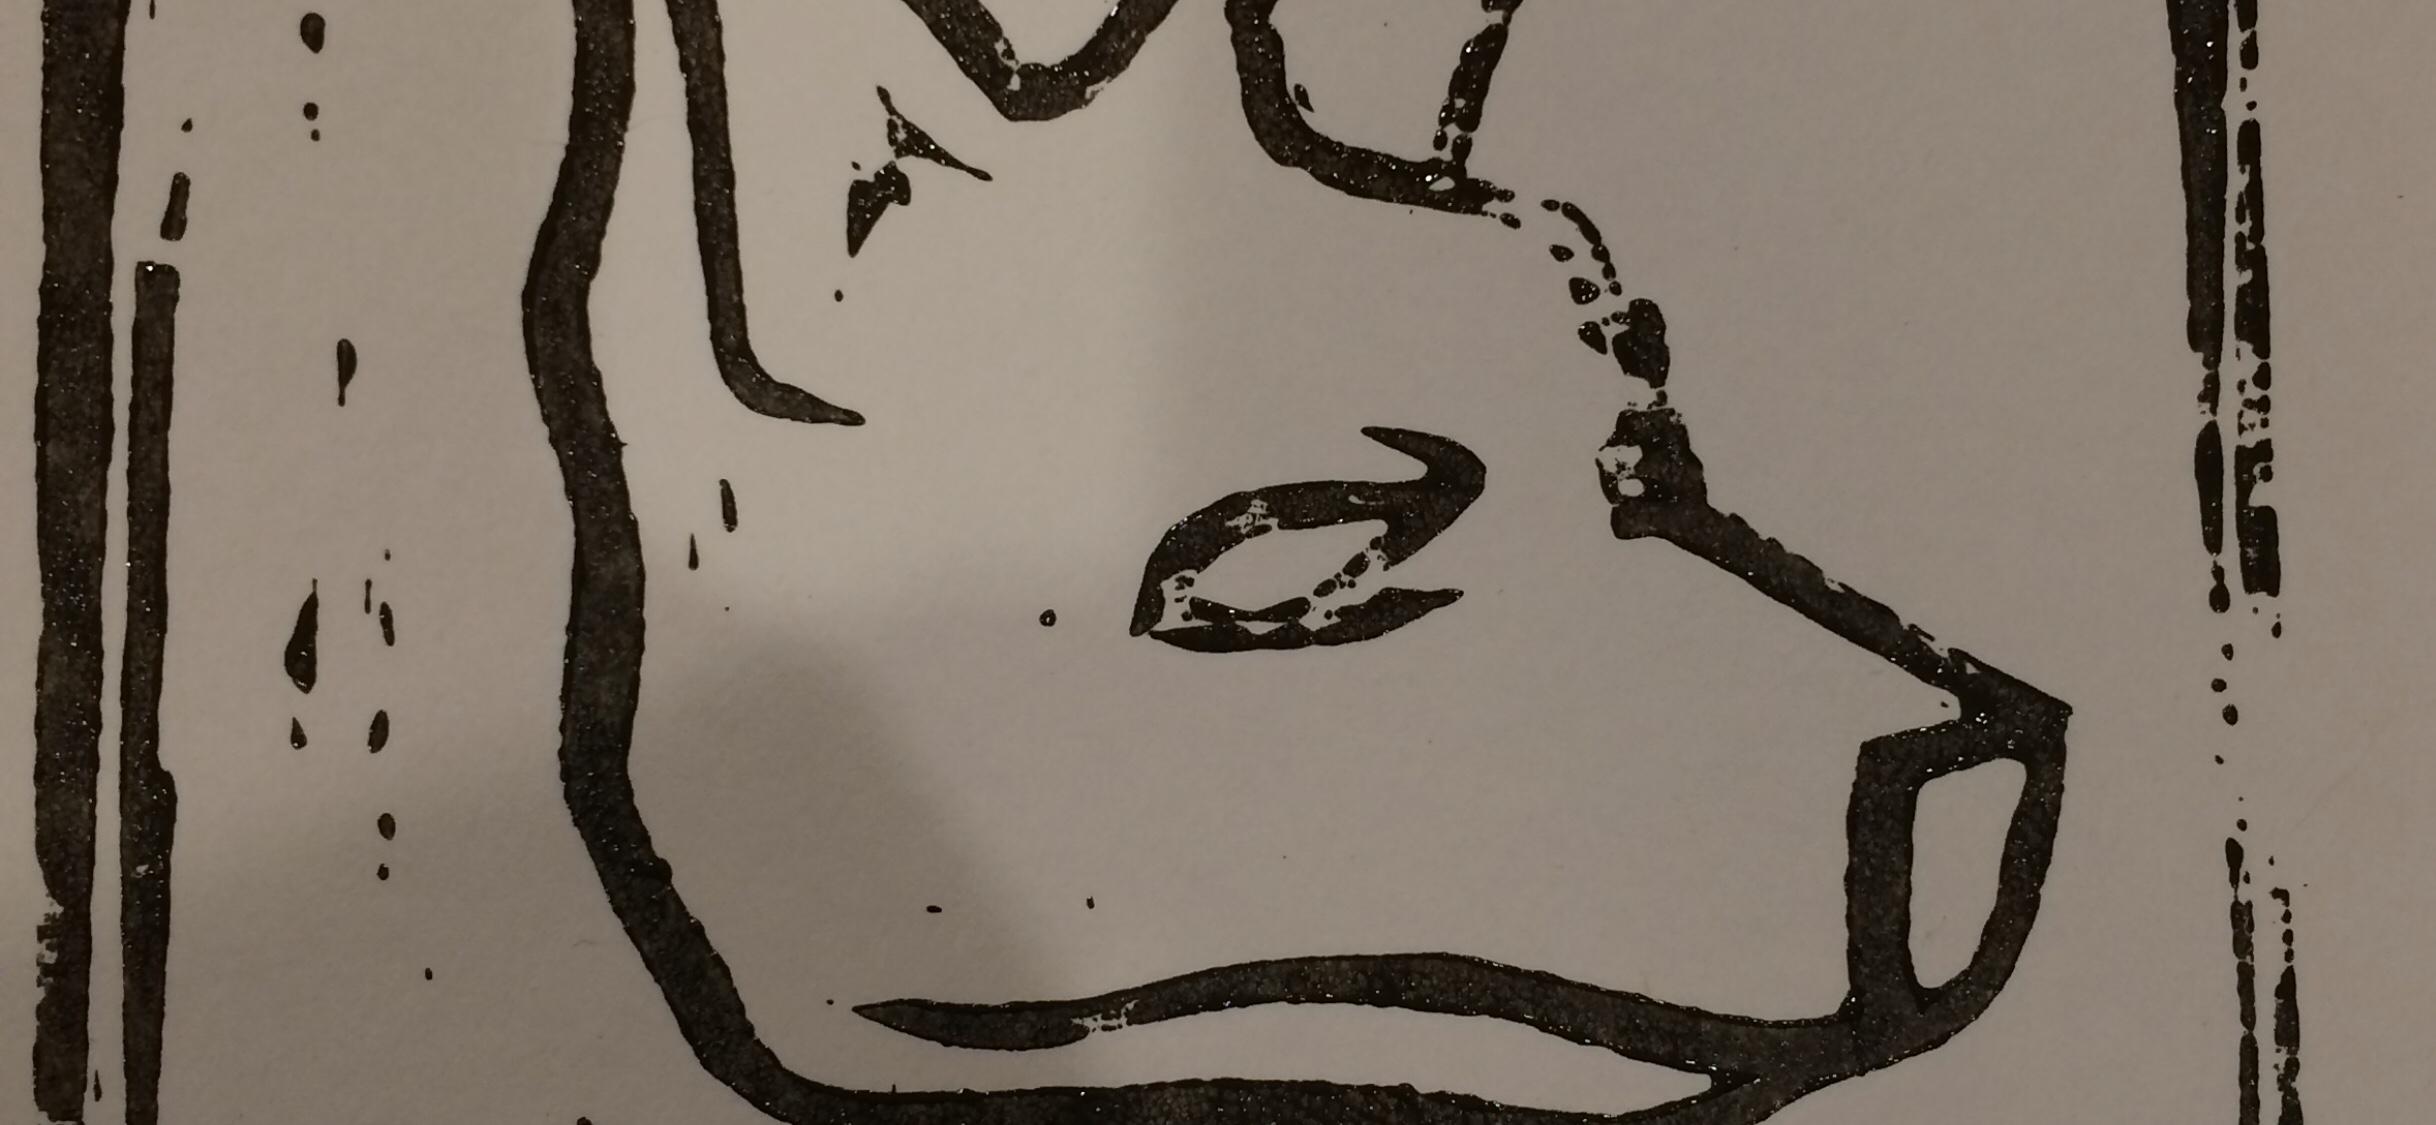 Designing Clem Head fills